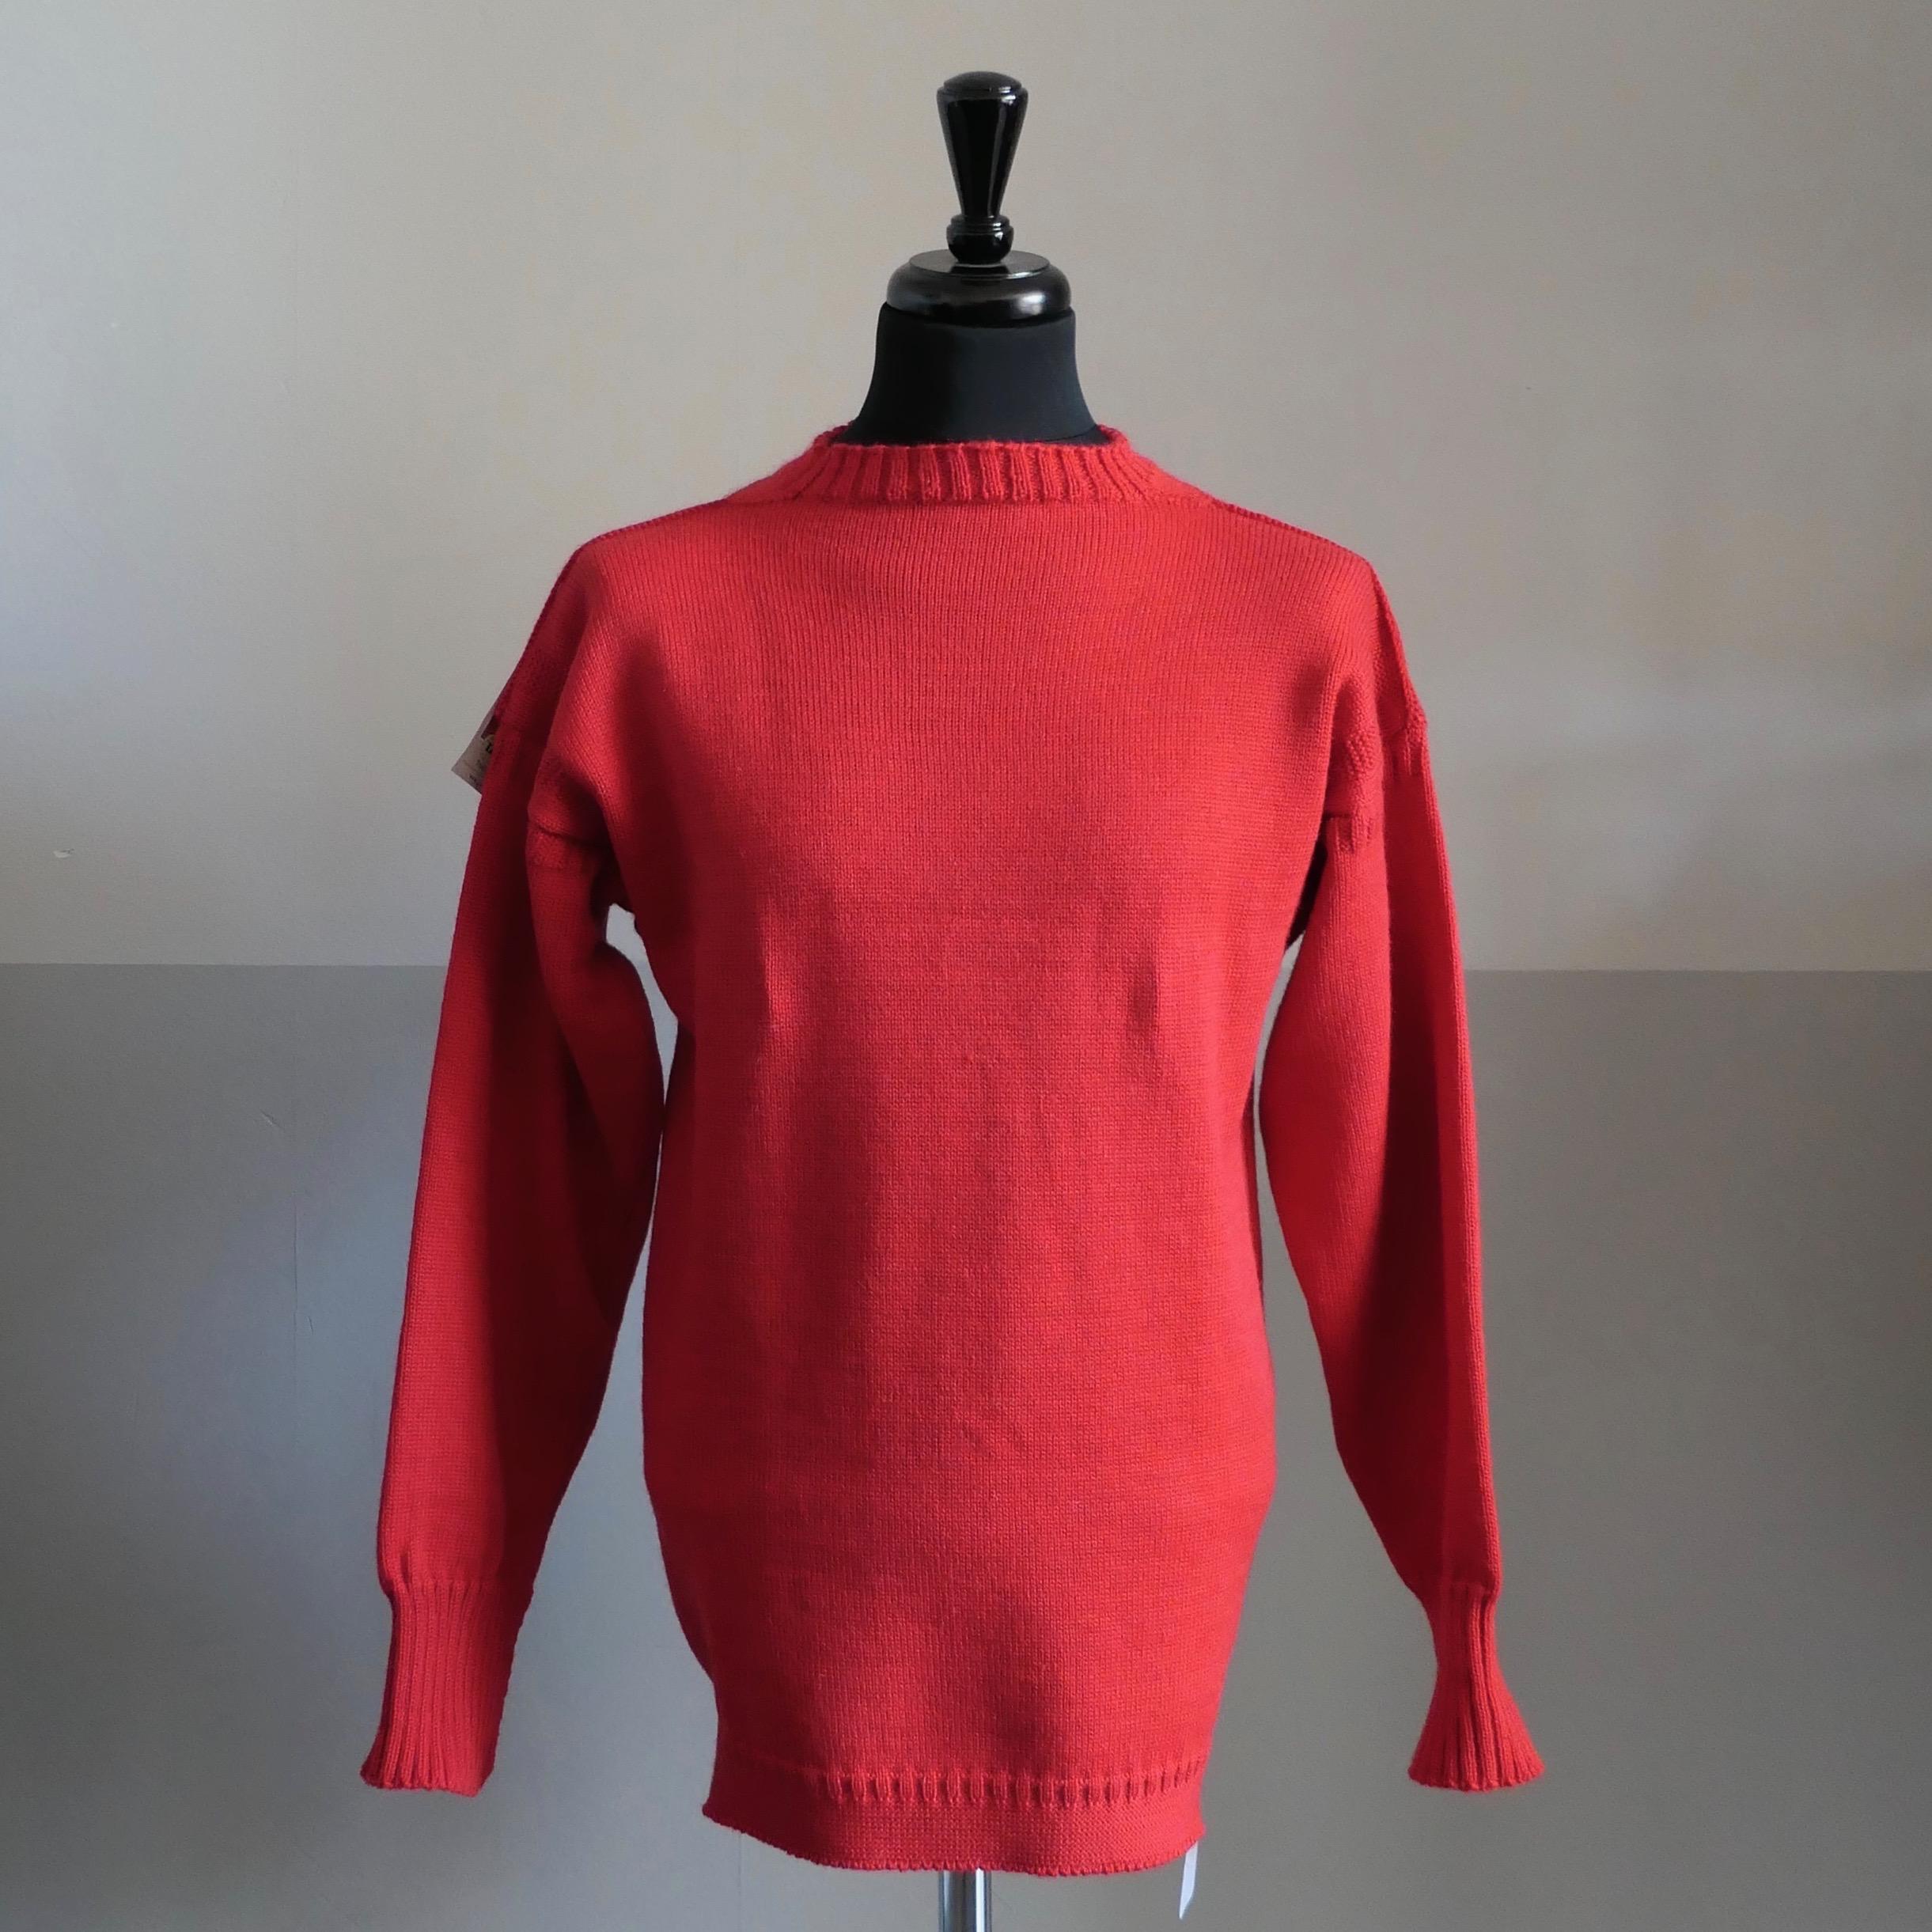 Guernsey Fisherman's Wool Sweater